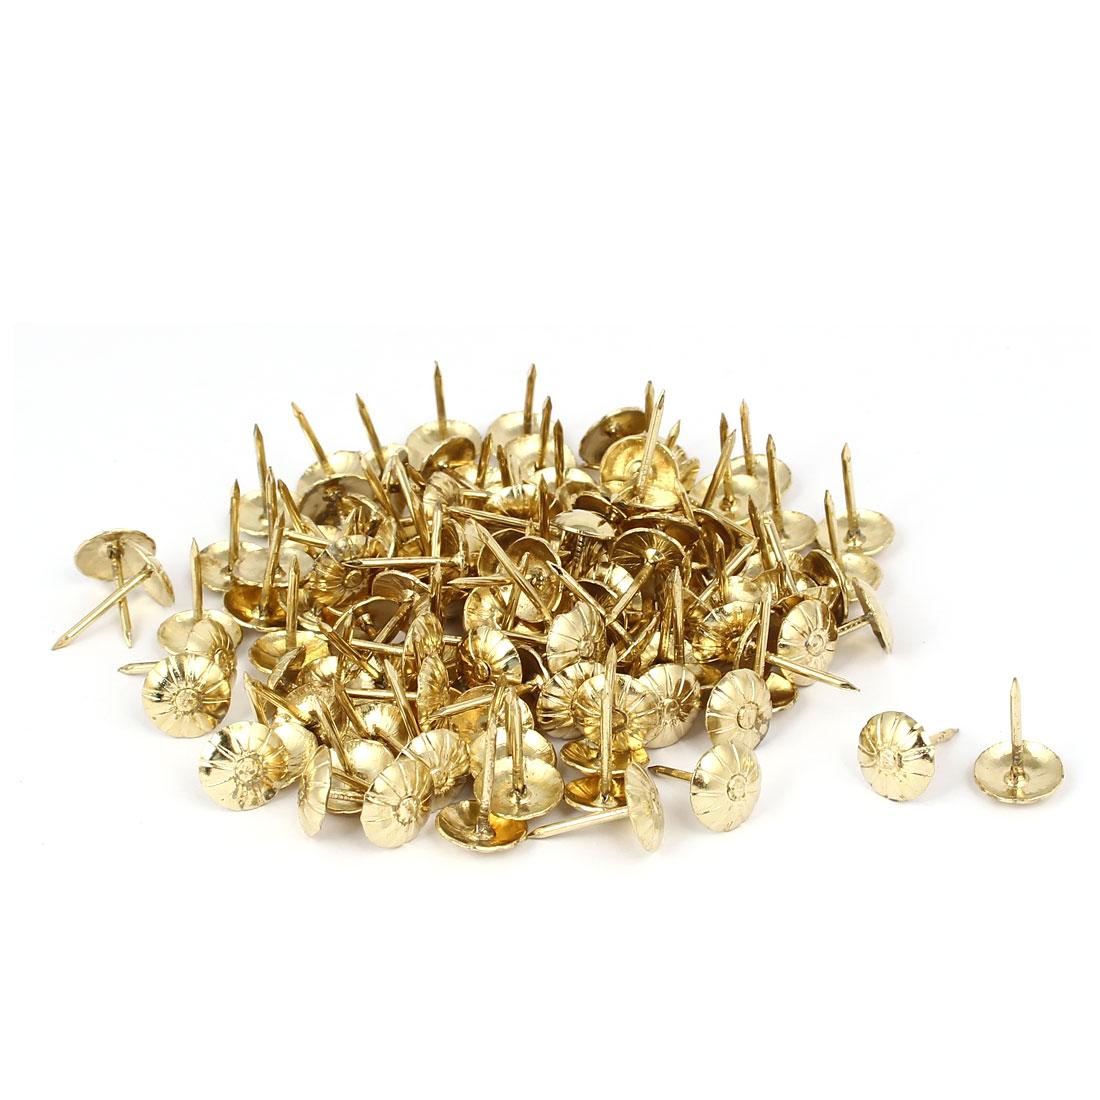 "7/16"" Dia Metal Round Domed Head Upholstery Tack Push Nail Gold Tone 120pcs"